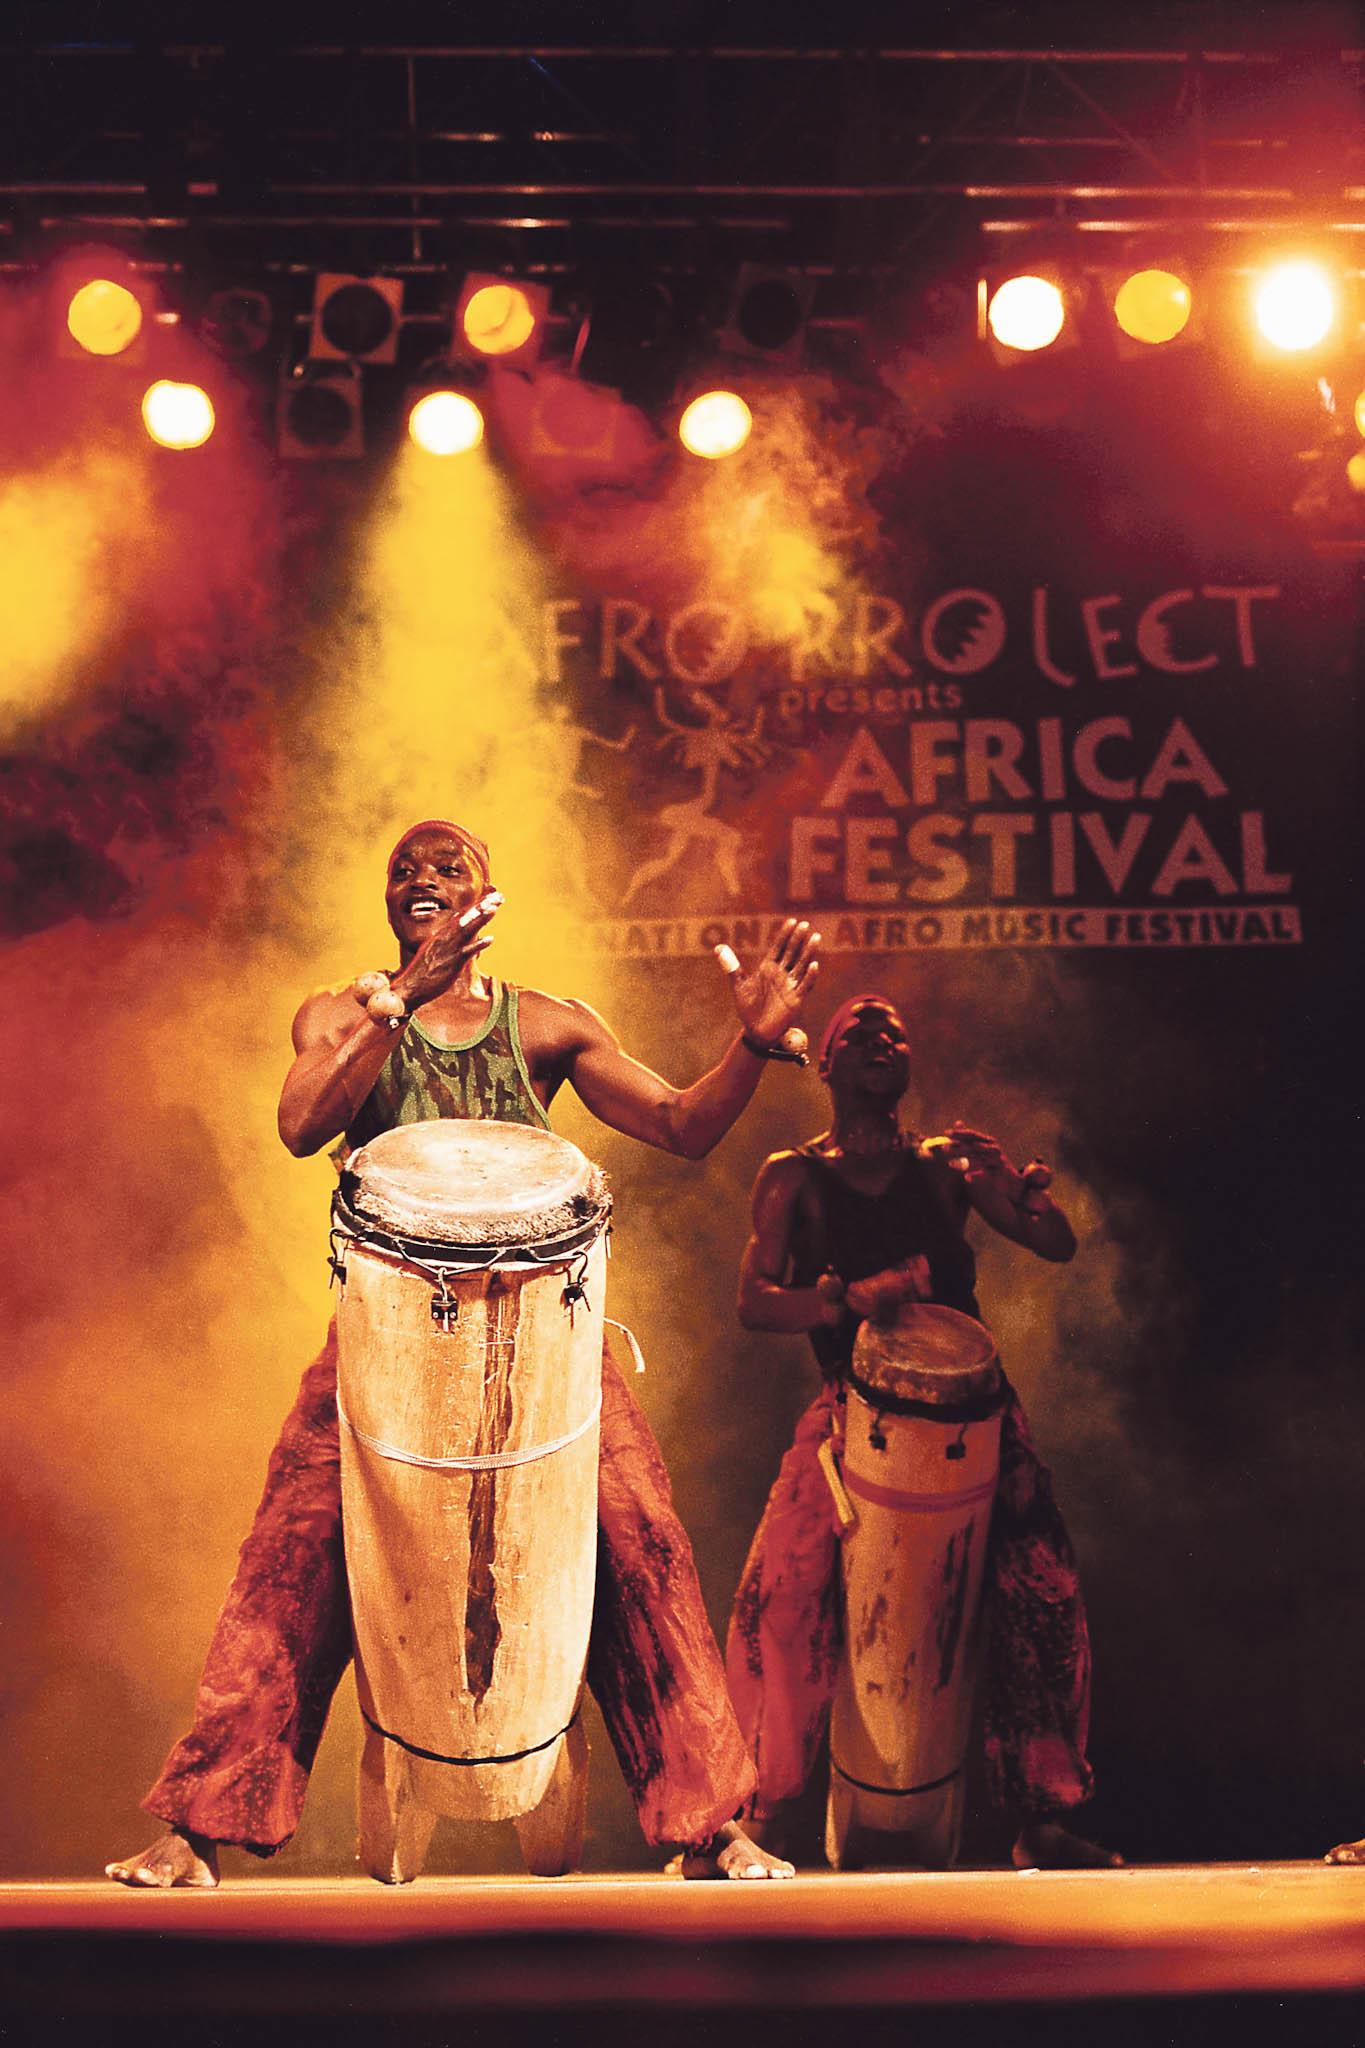 25. Africa Festival Würzburg